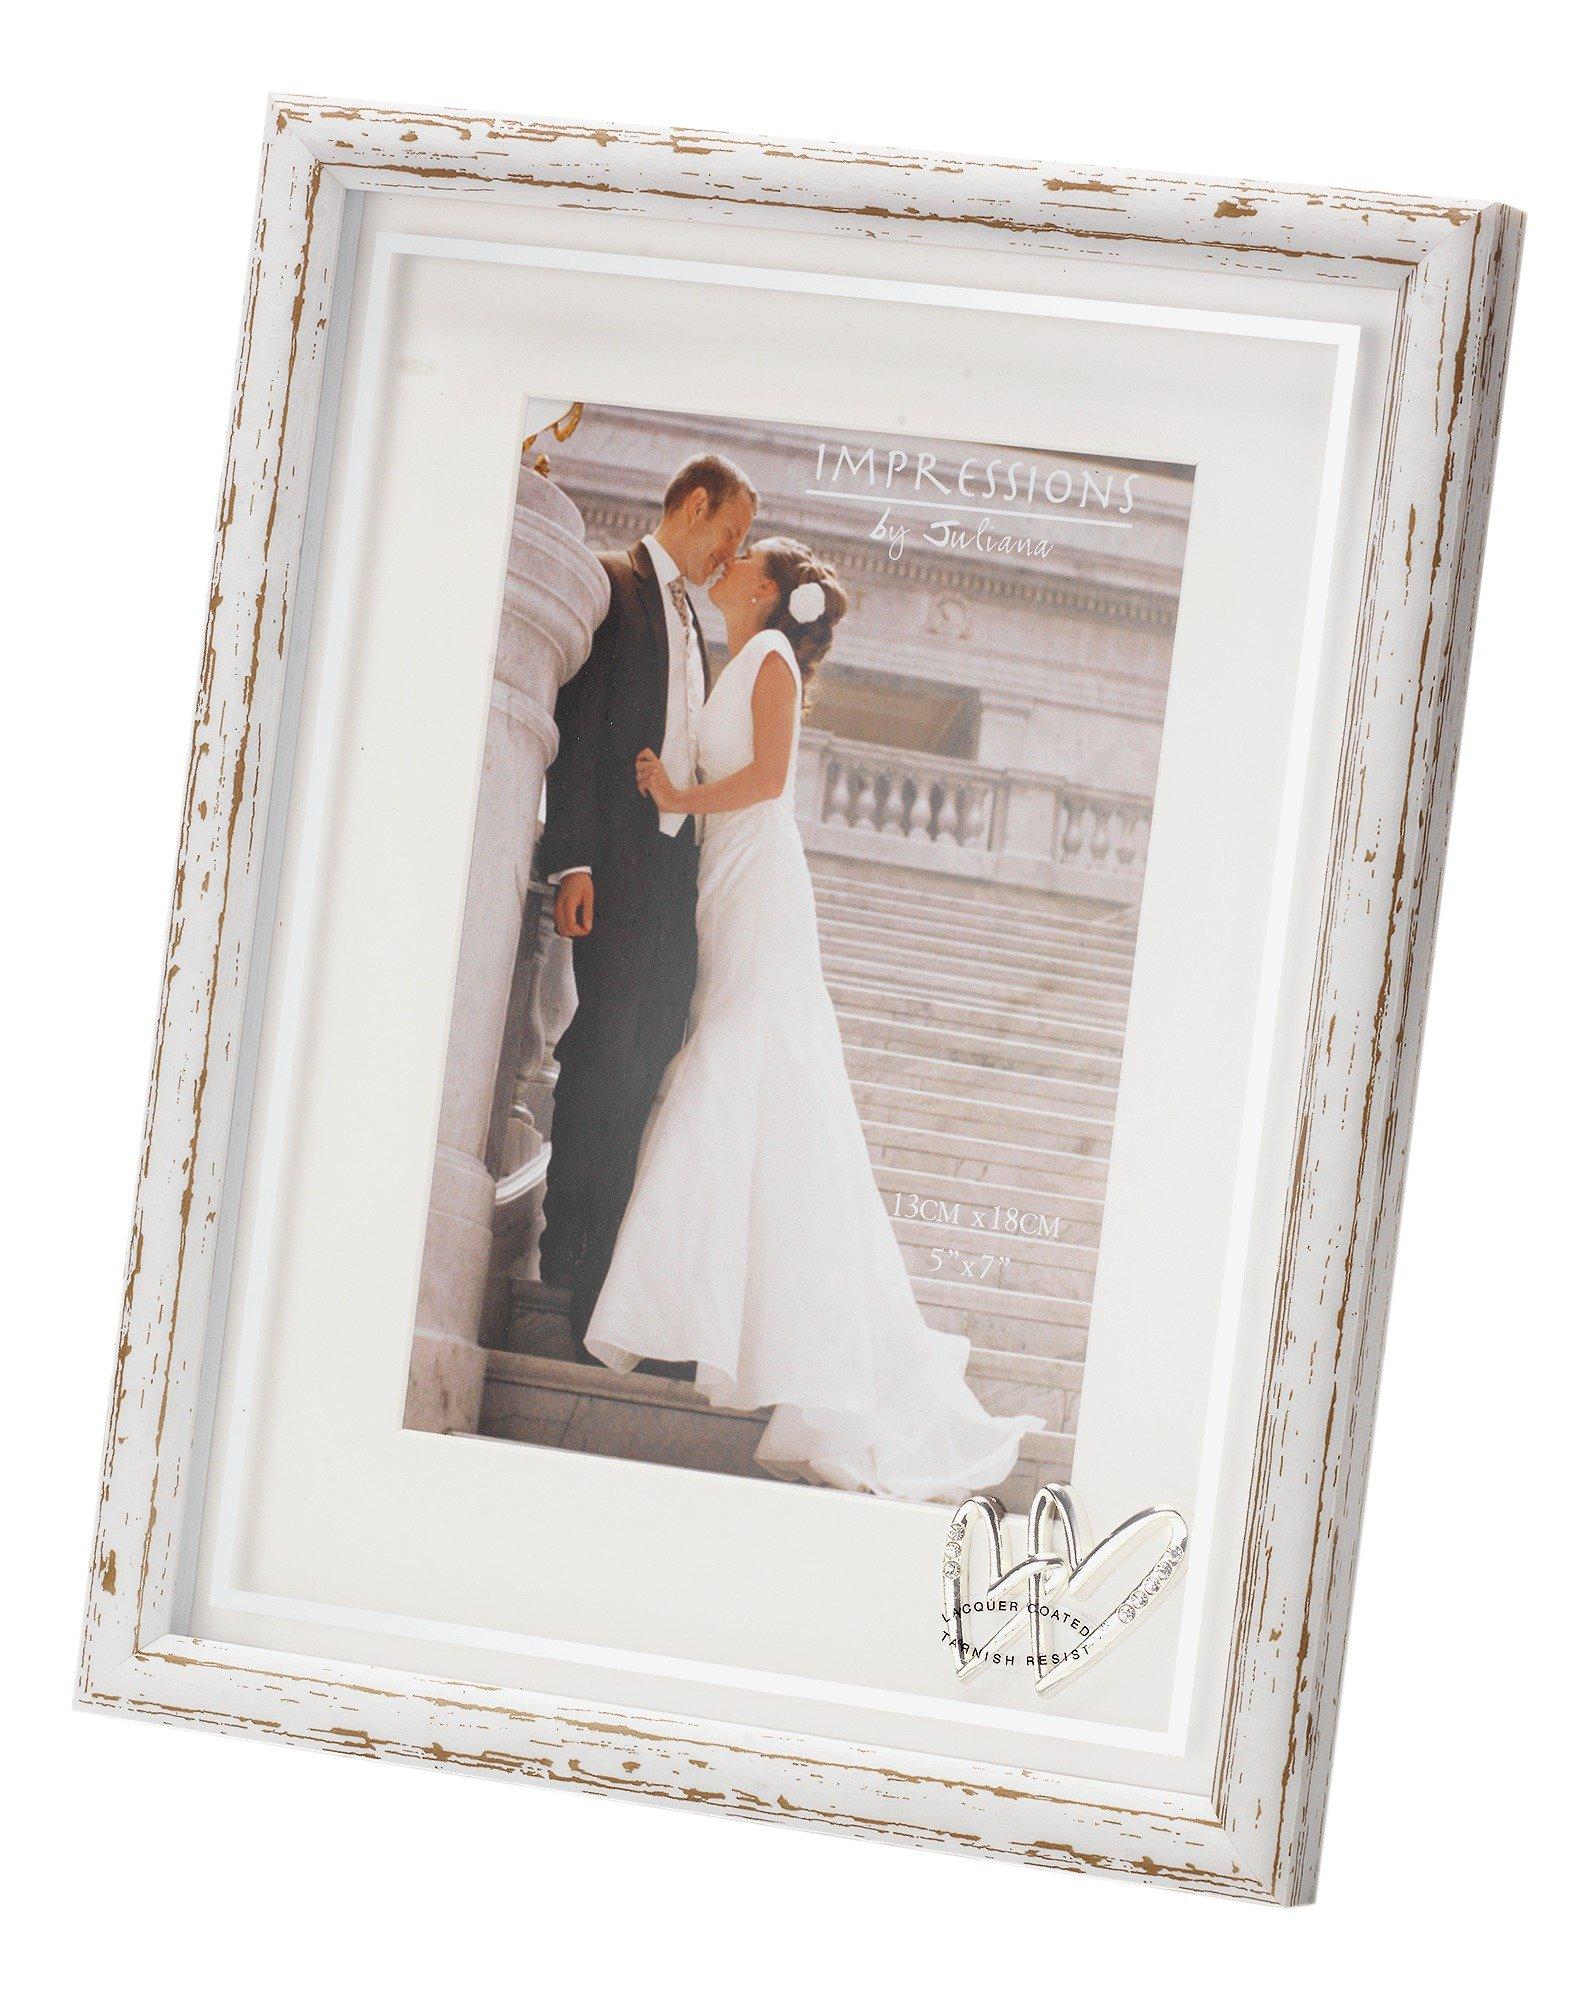 Image of Juliana Wedding Hearts Photo Frame